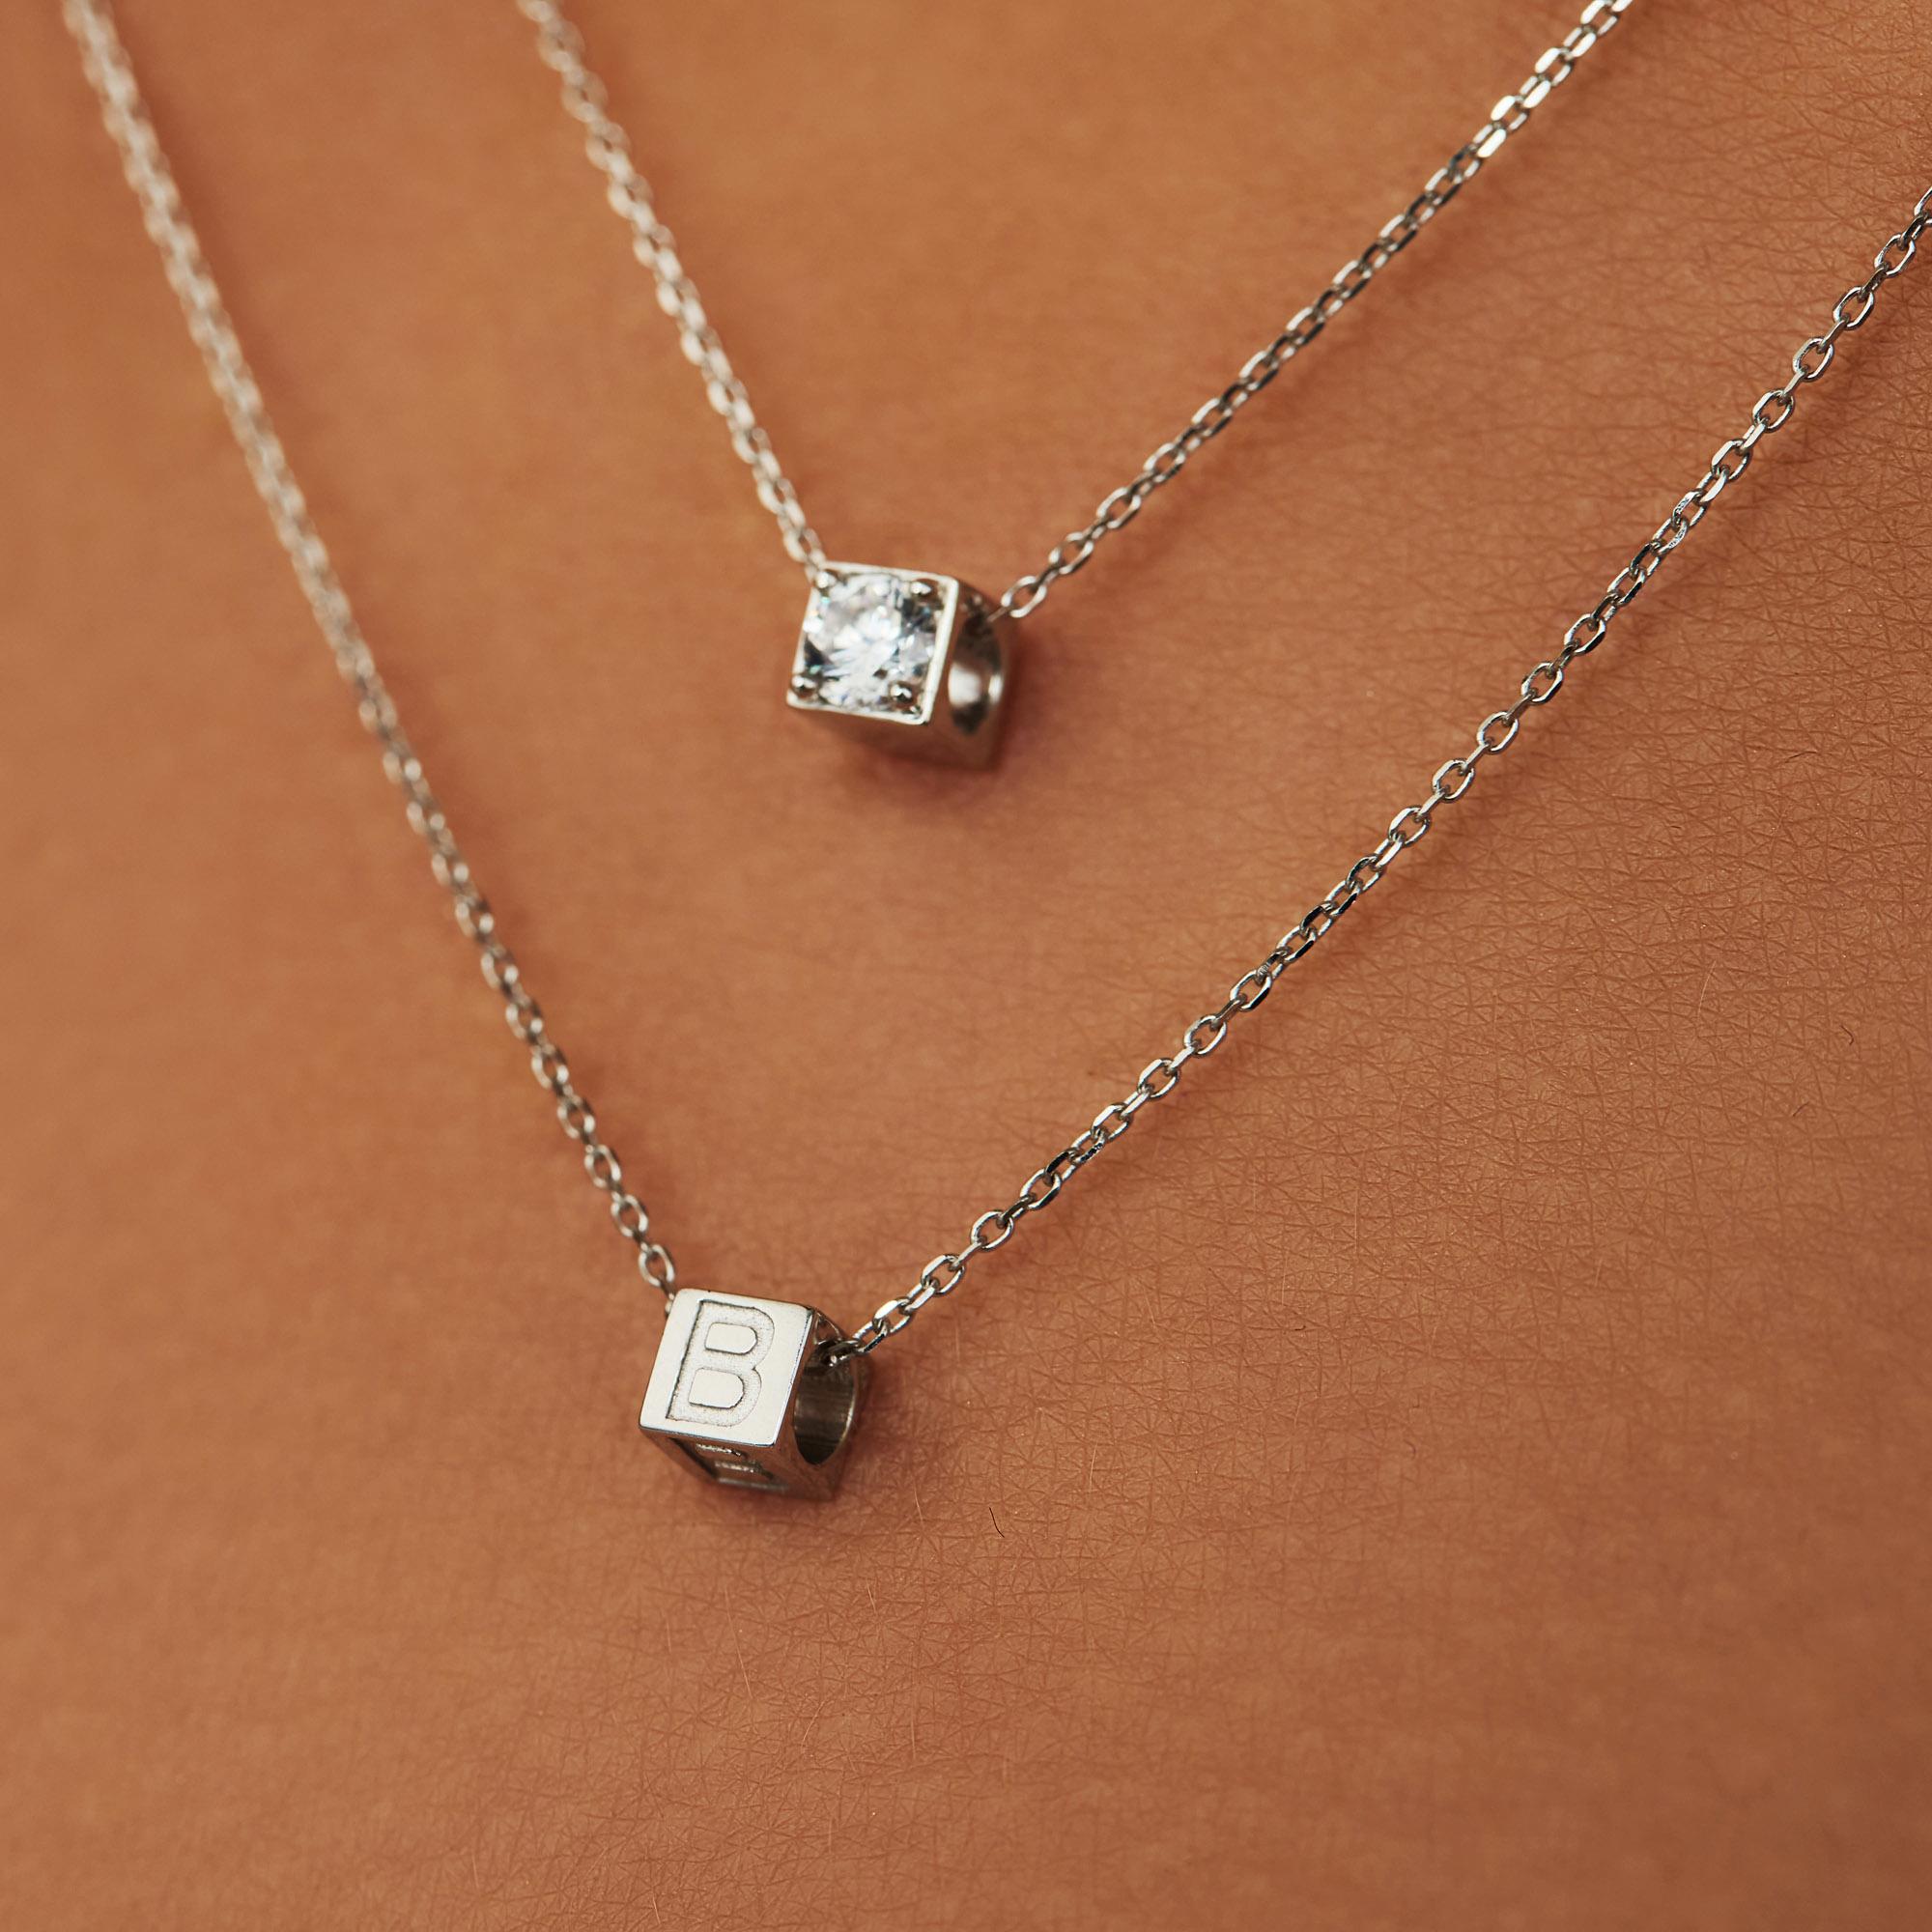 Isabel Bernard Saint Germain Felie 14 karat white gold cube charm with heart